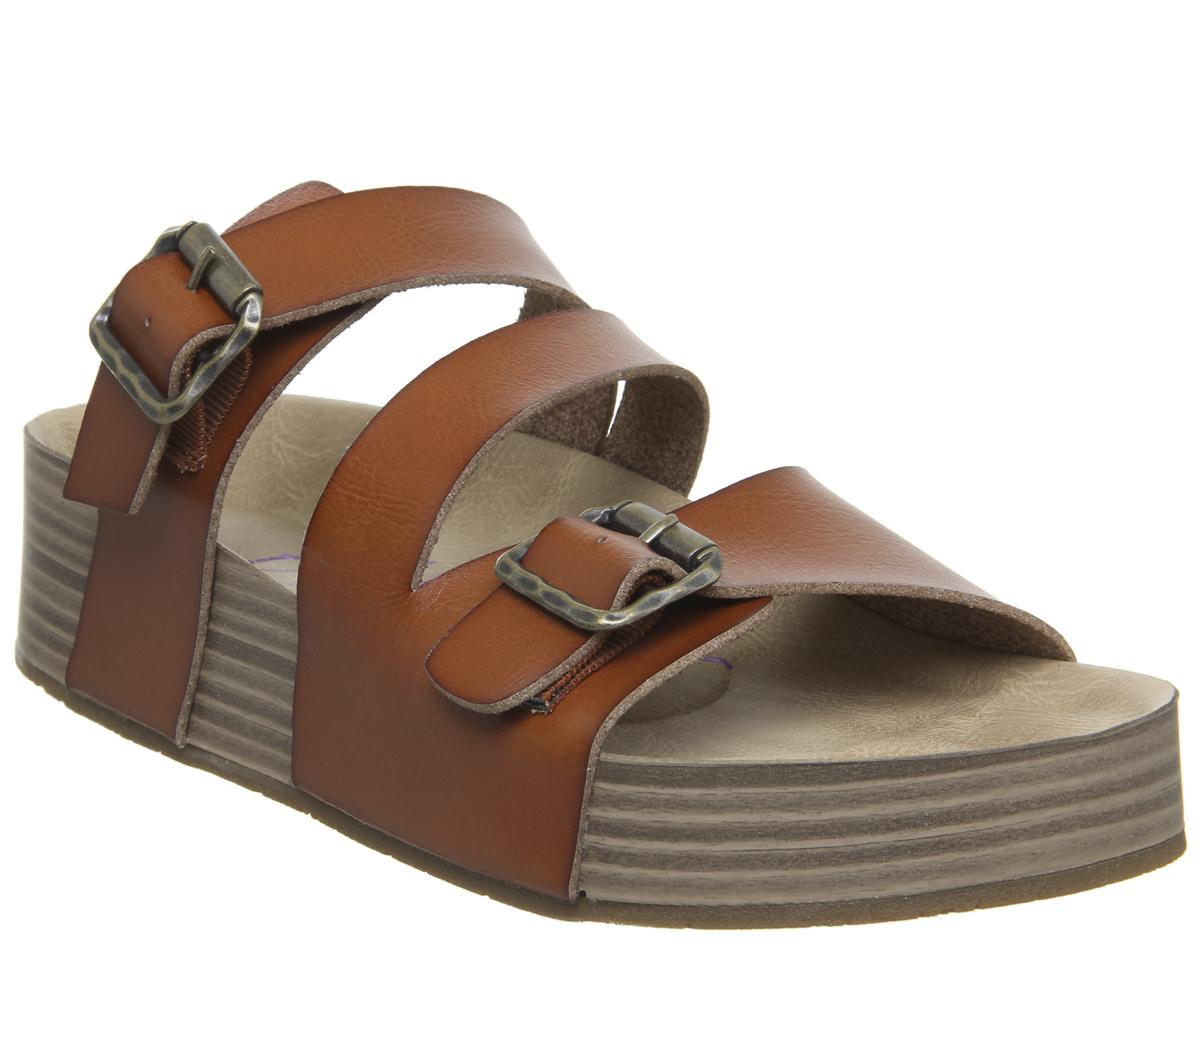 Major Sandals